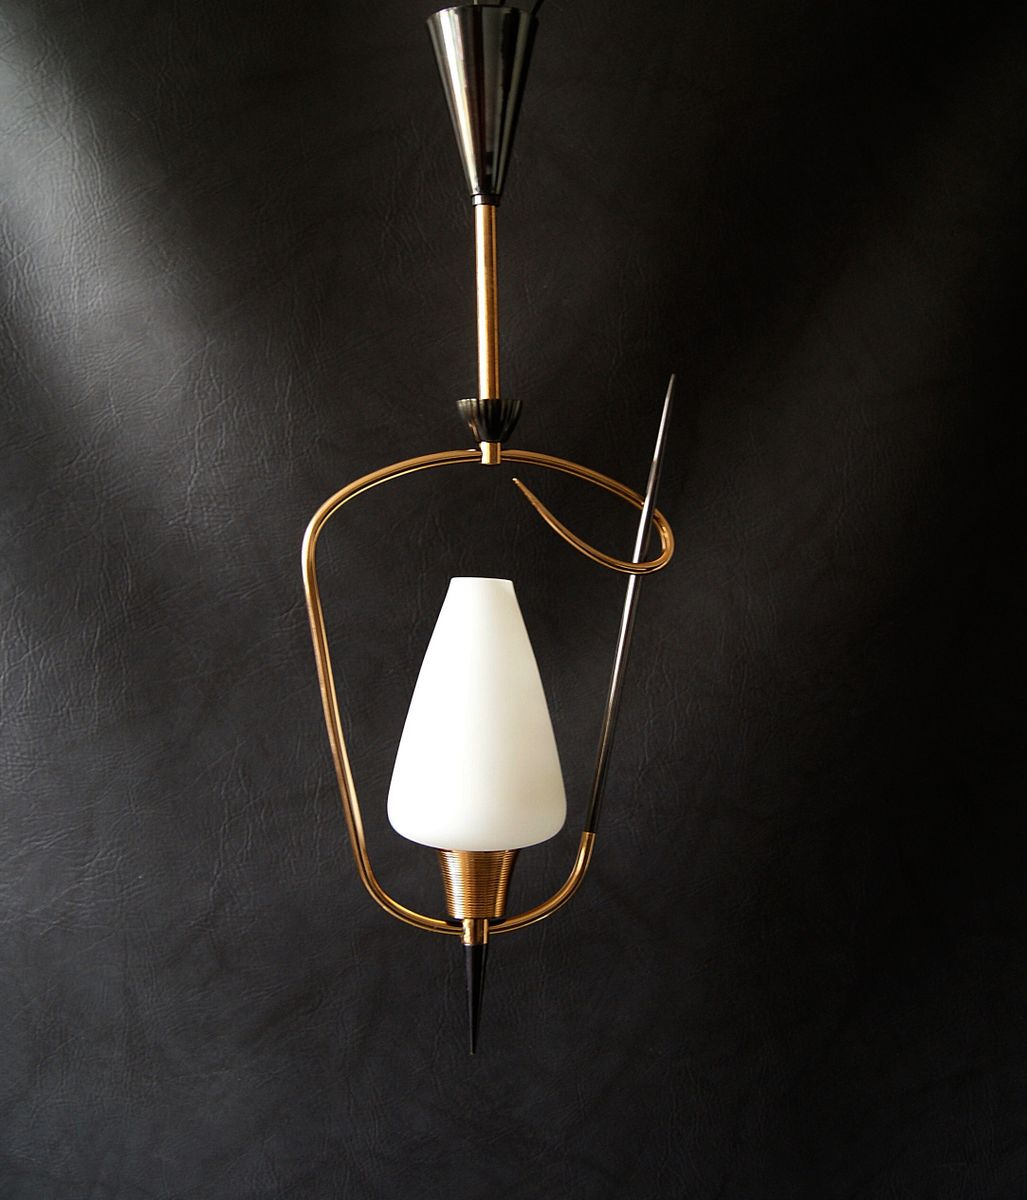 Pendant Lamp from Arlus, 1950s